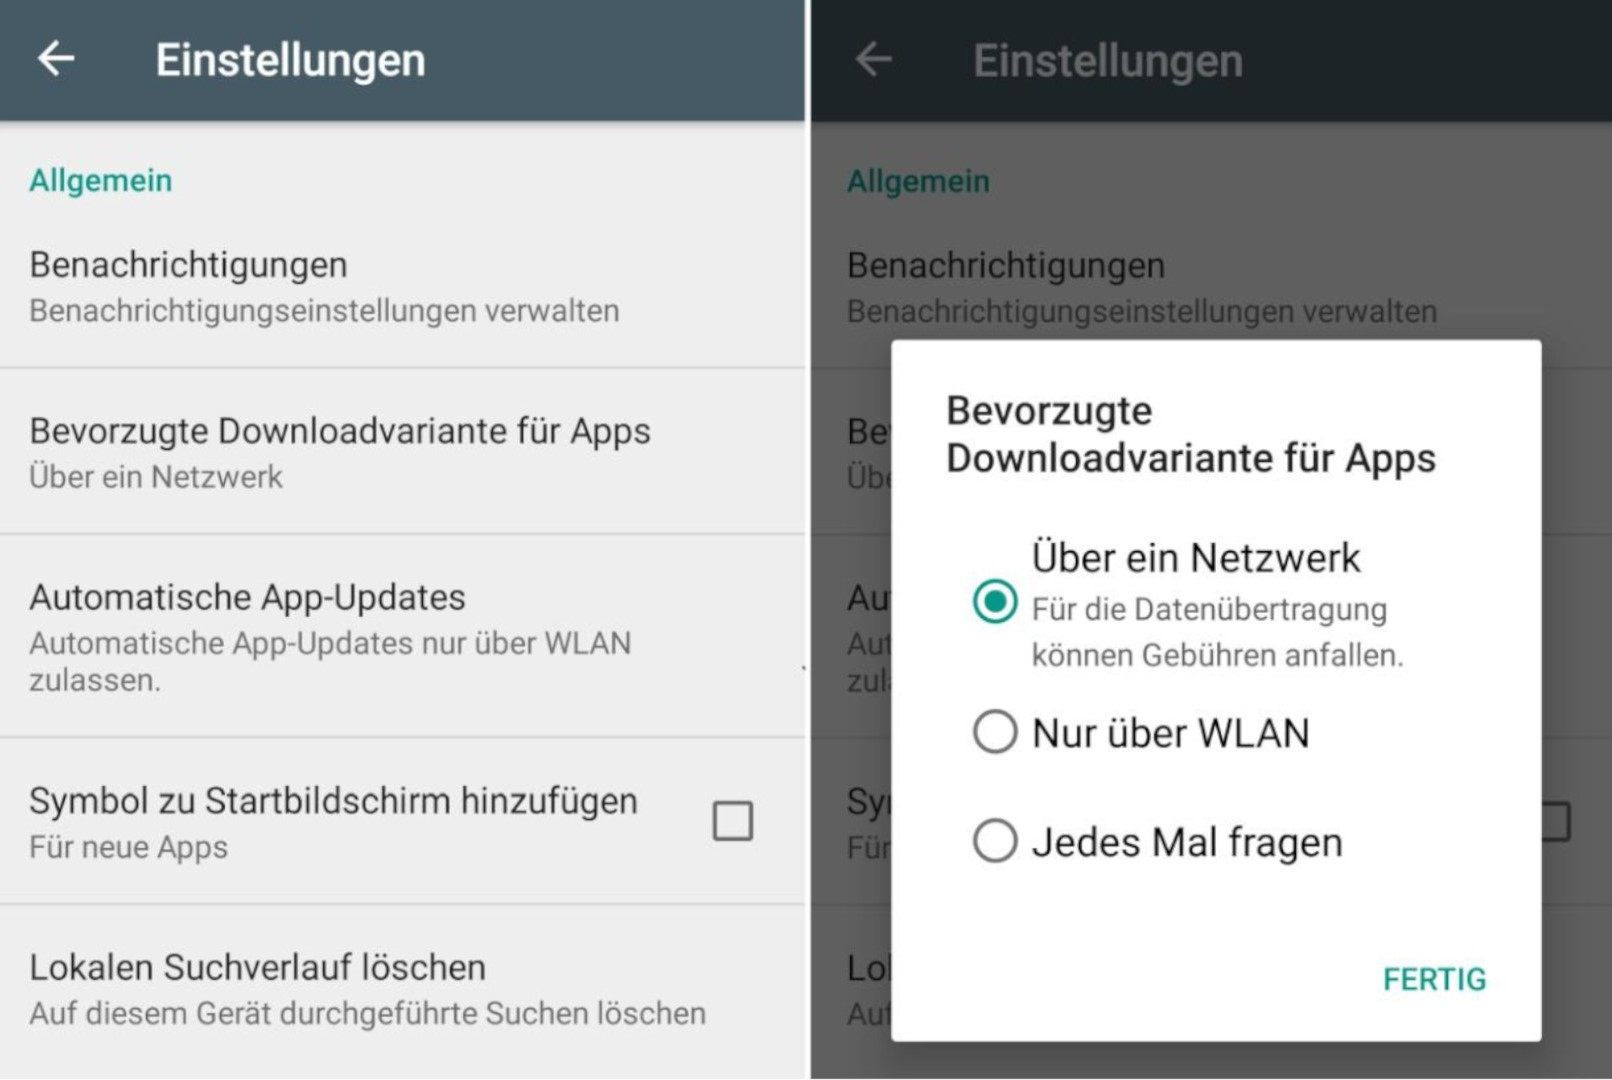 Google Play Store Es Kann Keine Stabile Verbindung